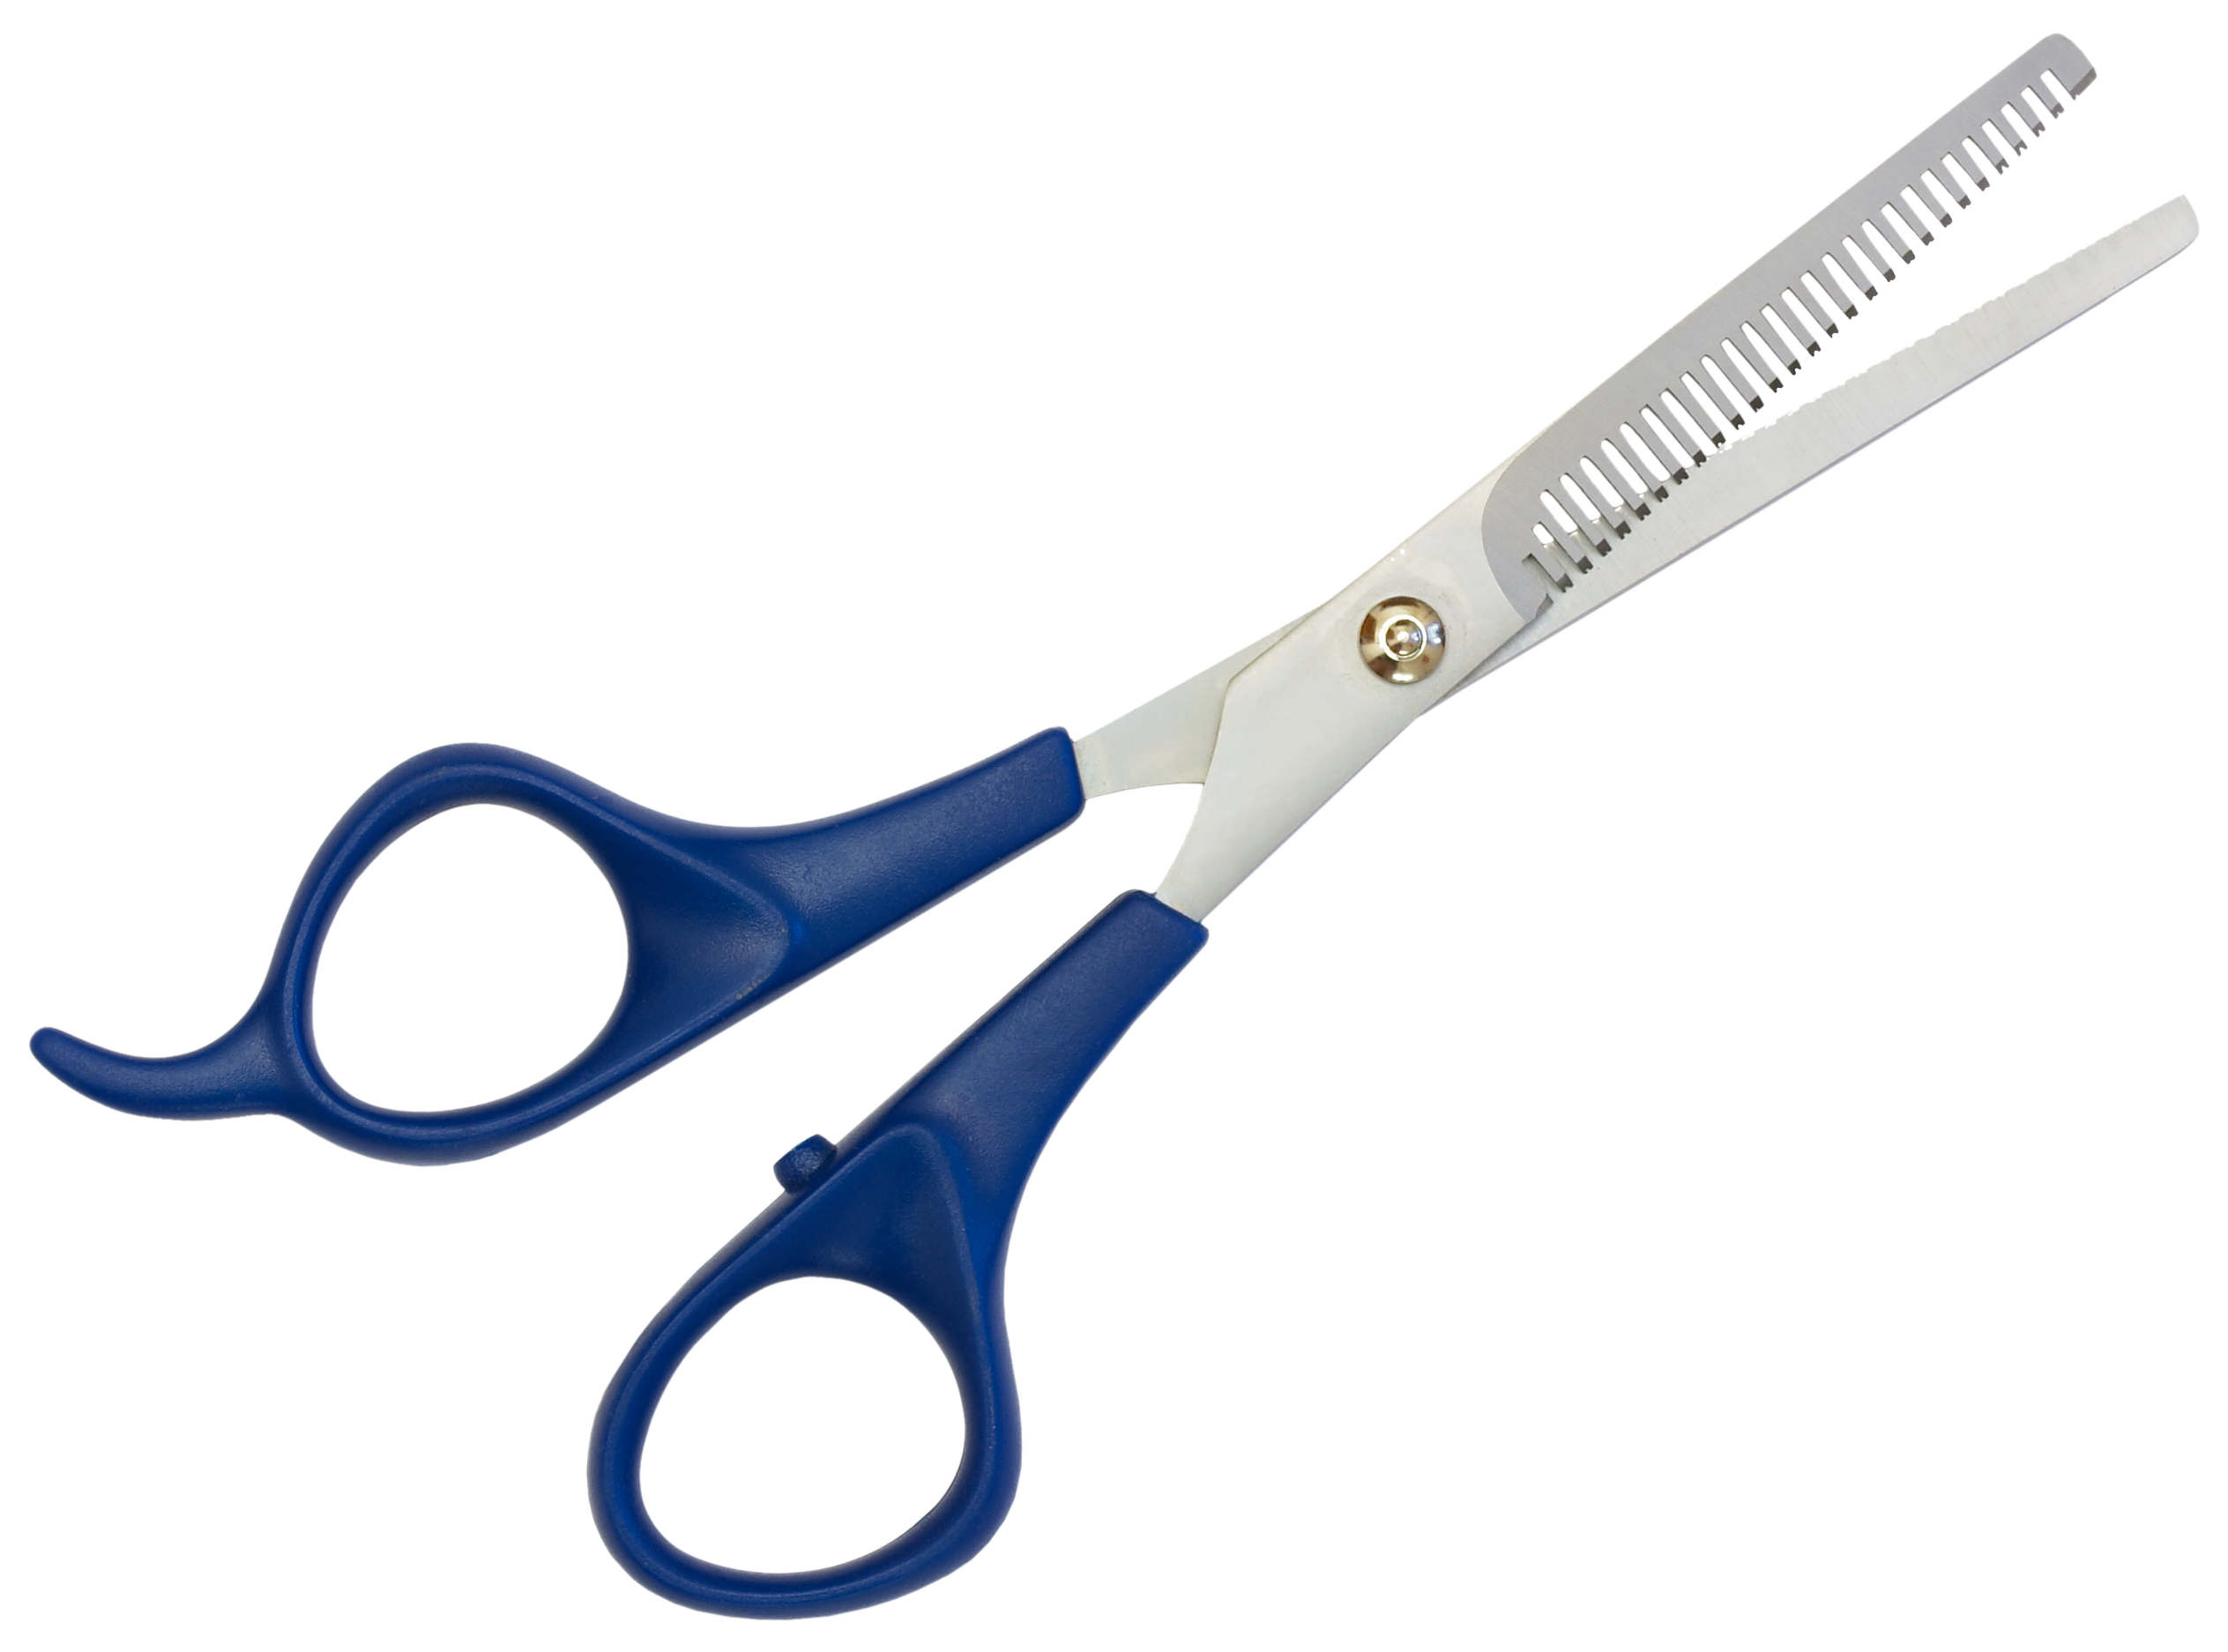 Scissors And Comb Free Vector Icons Designed By Freepik Hair Salon Logos Hair Salon Design Hair Icon